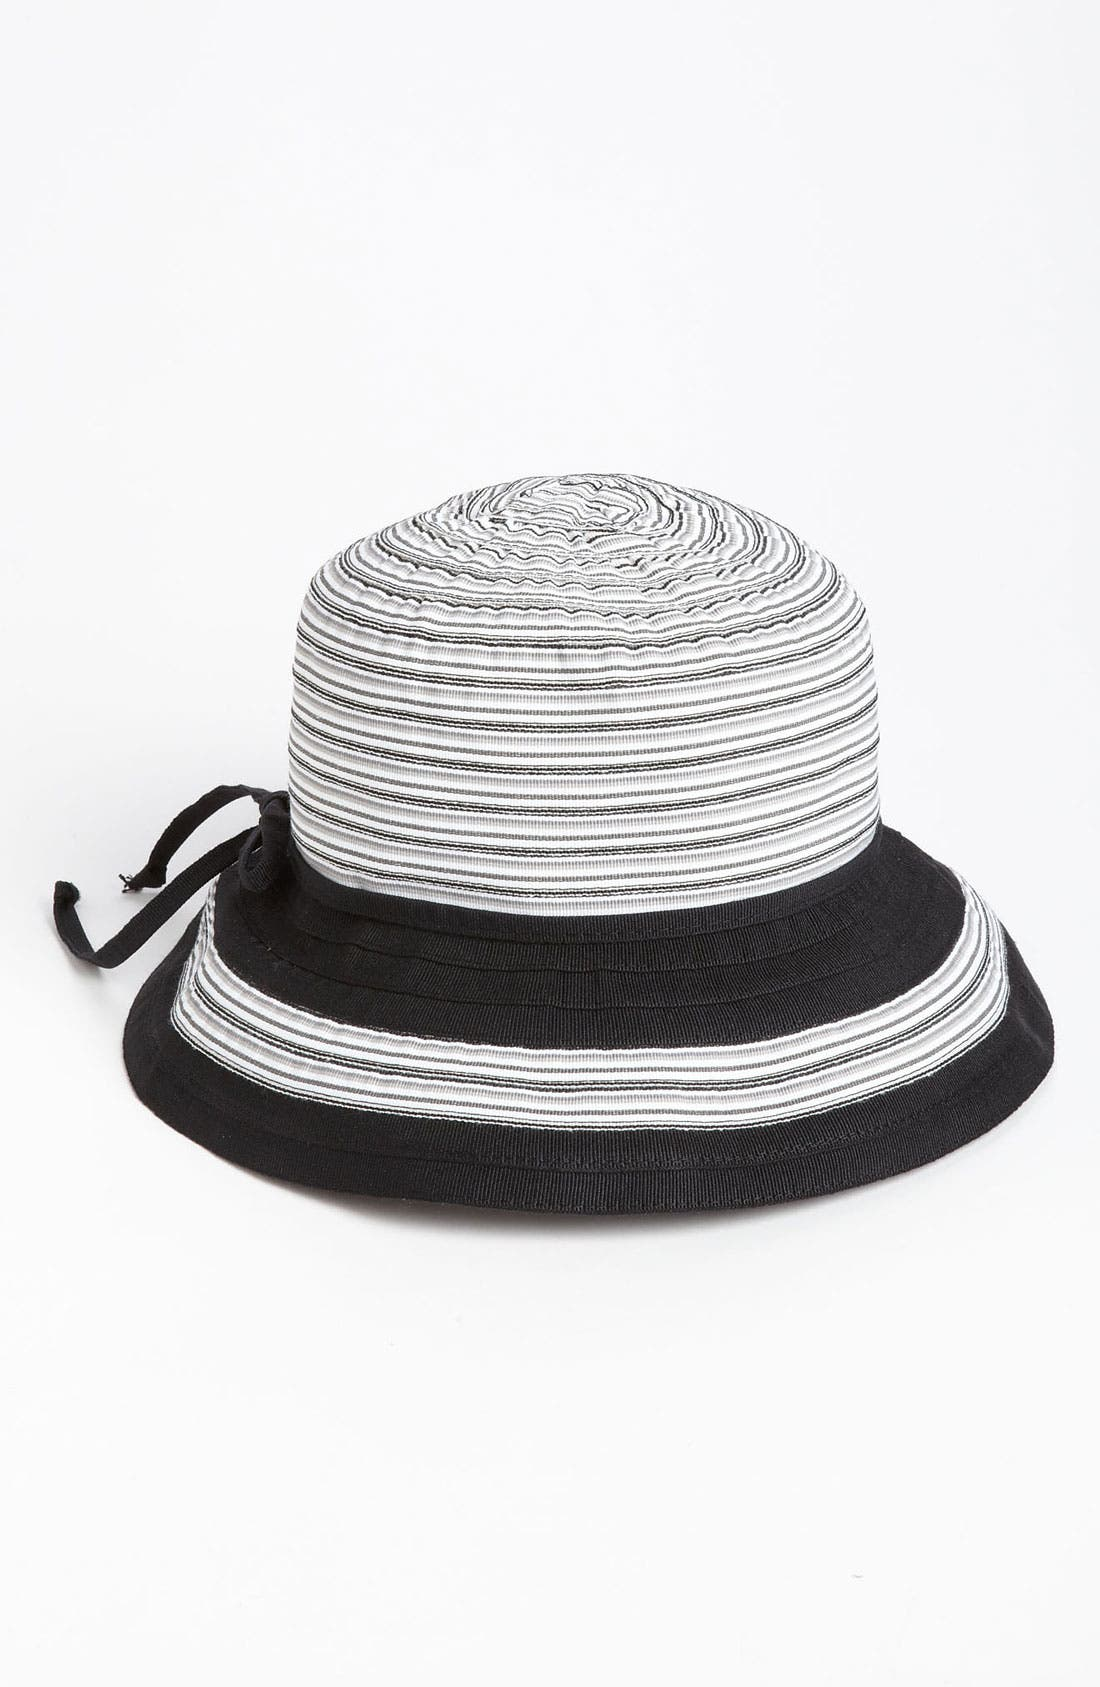 Main Image - Nordstrom Striped Bucket Hat